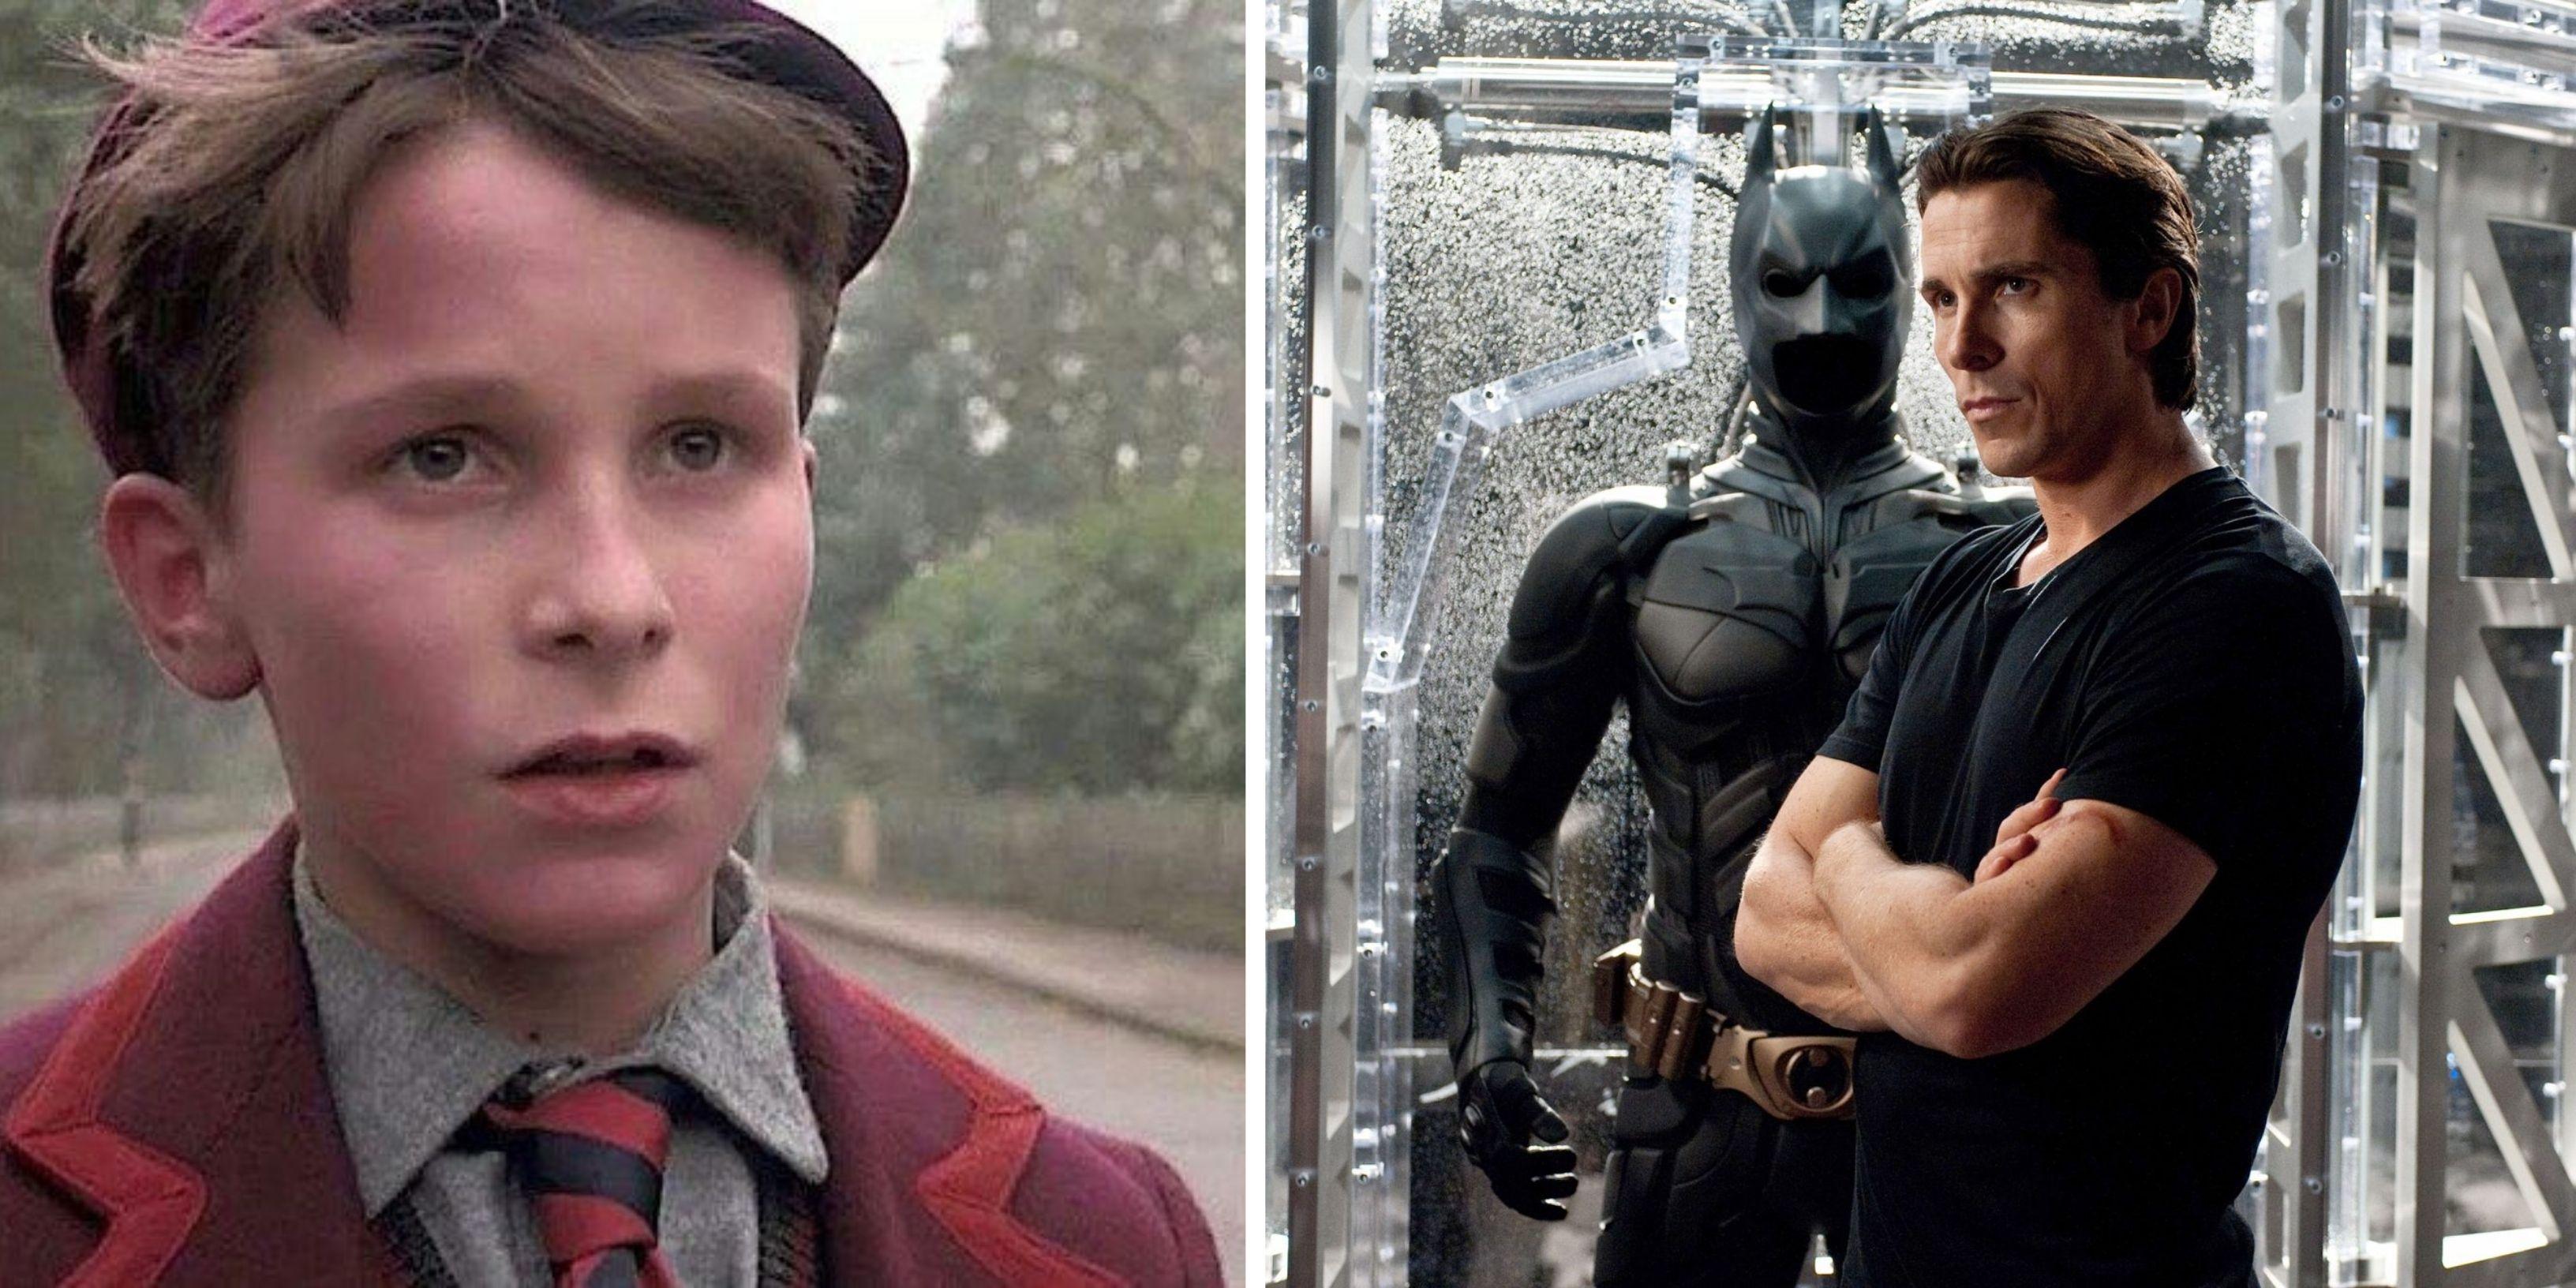 Christian Bale's Best Movies According To IMDb | TheThings